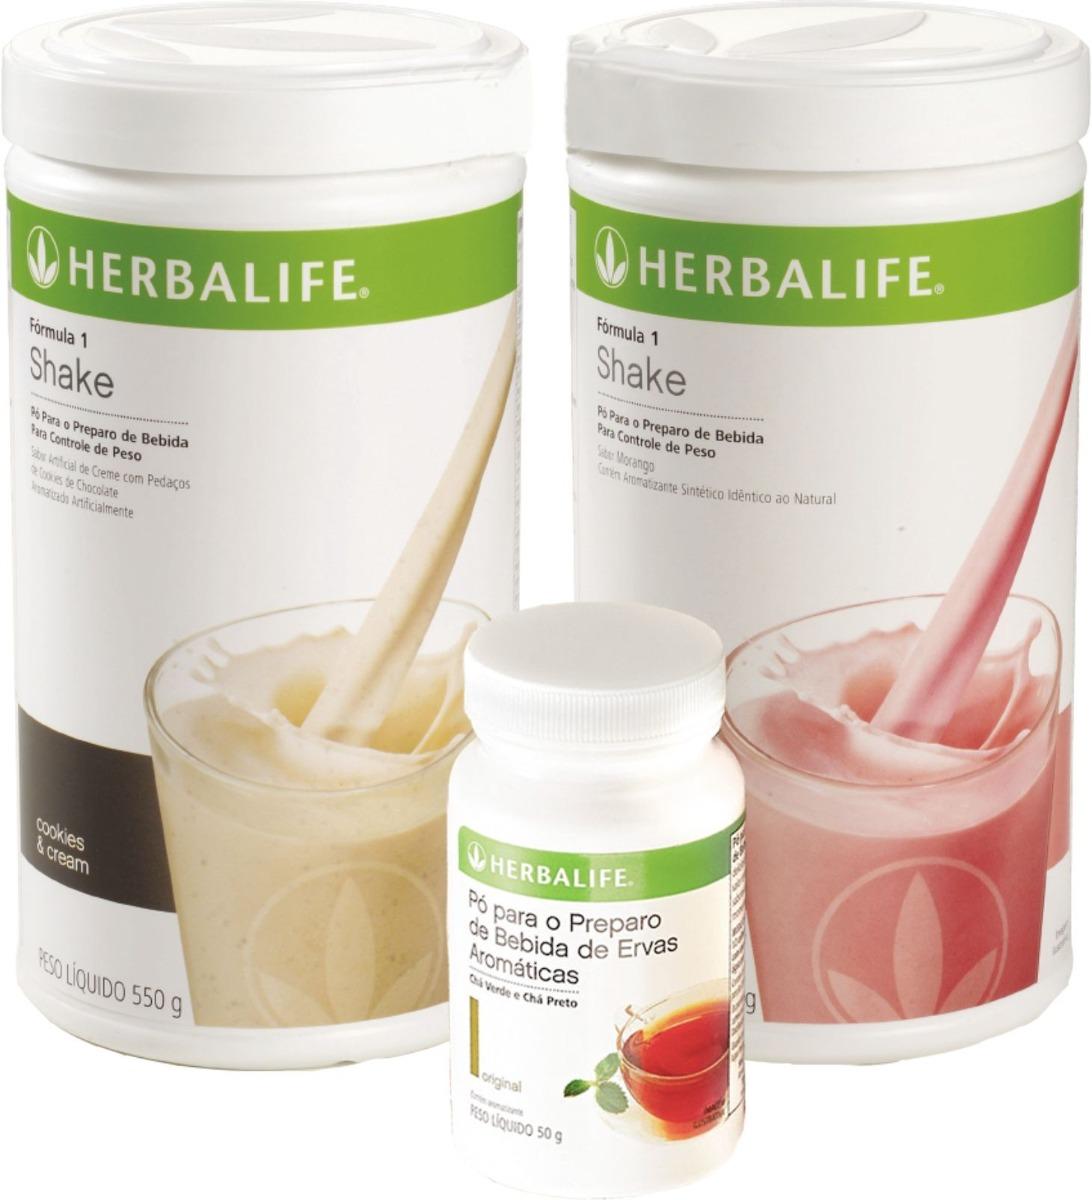 02-shakes-herbalife-thermo-perder-peso-brinde-watsapp-D_NQ_NP_101511-MLB20563616950_012016-F.jpg